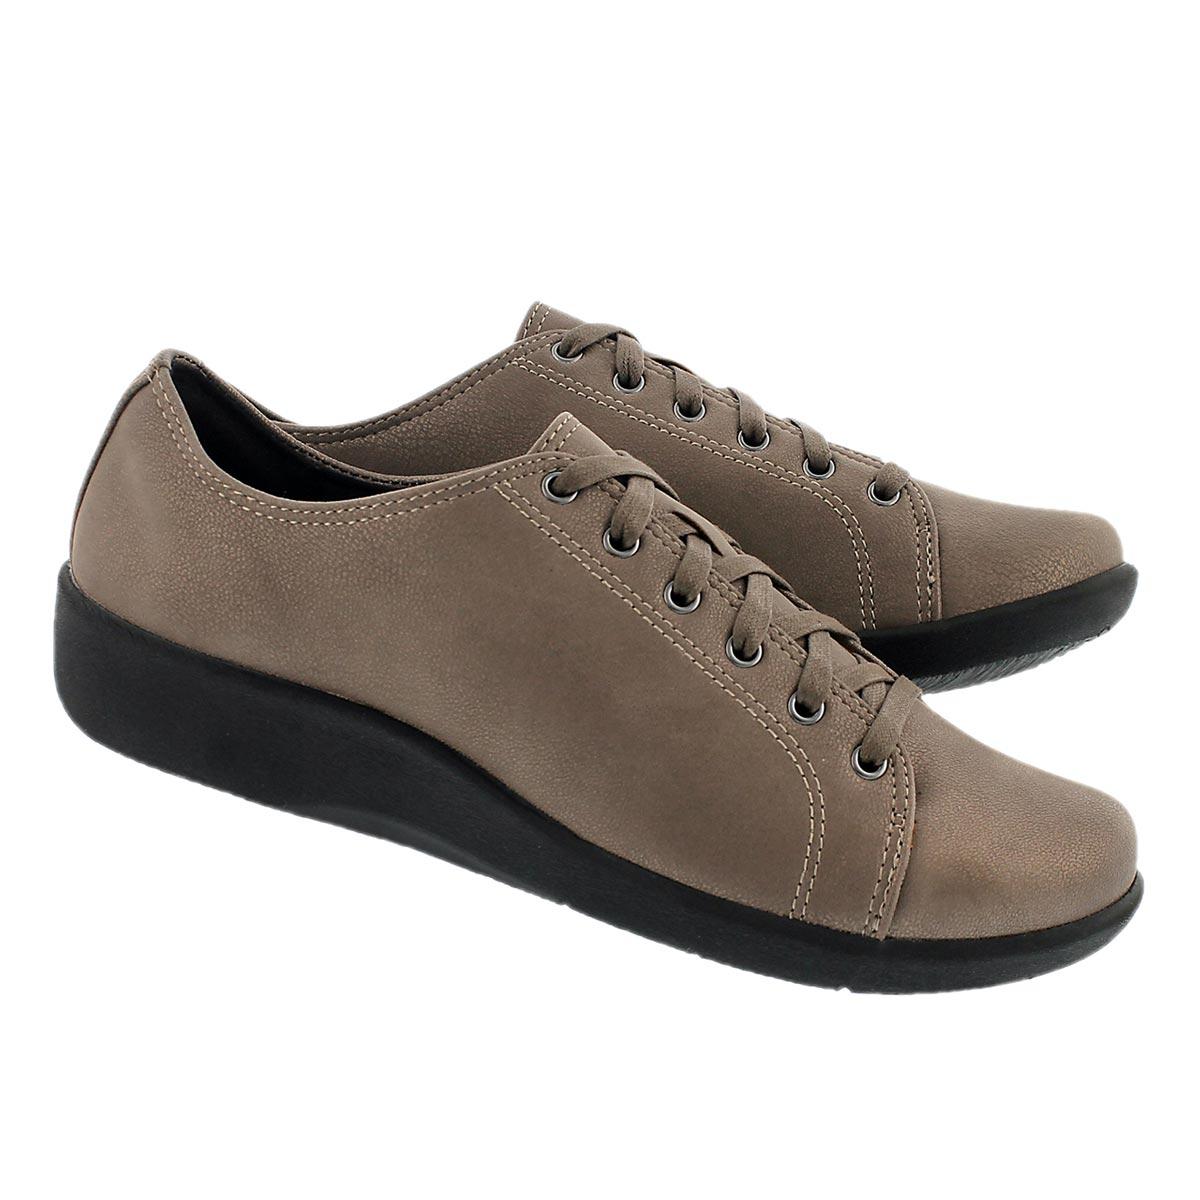 Chaussure lacée Sillian Glory, argt, fem